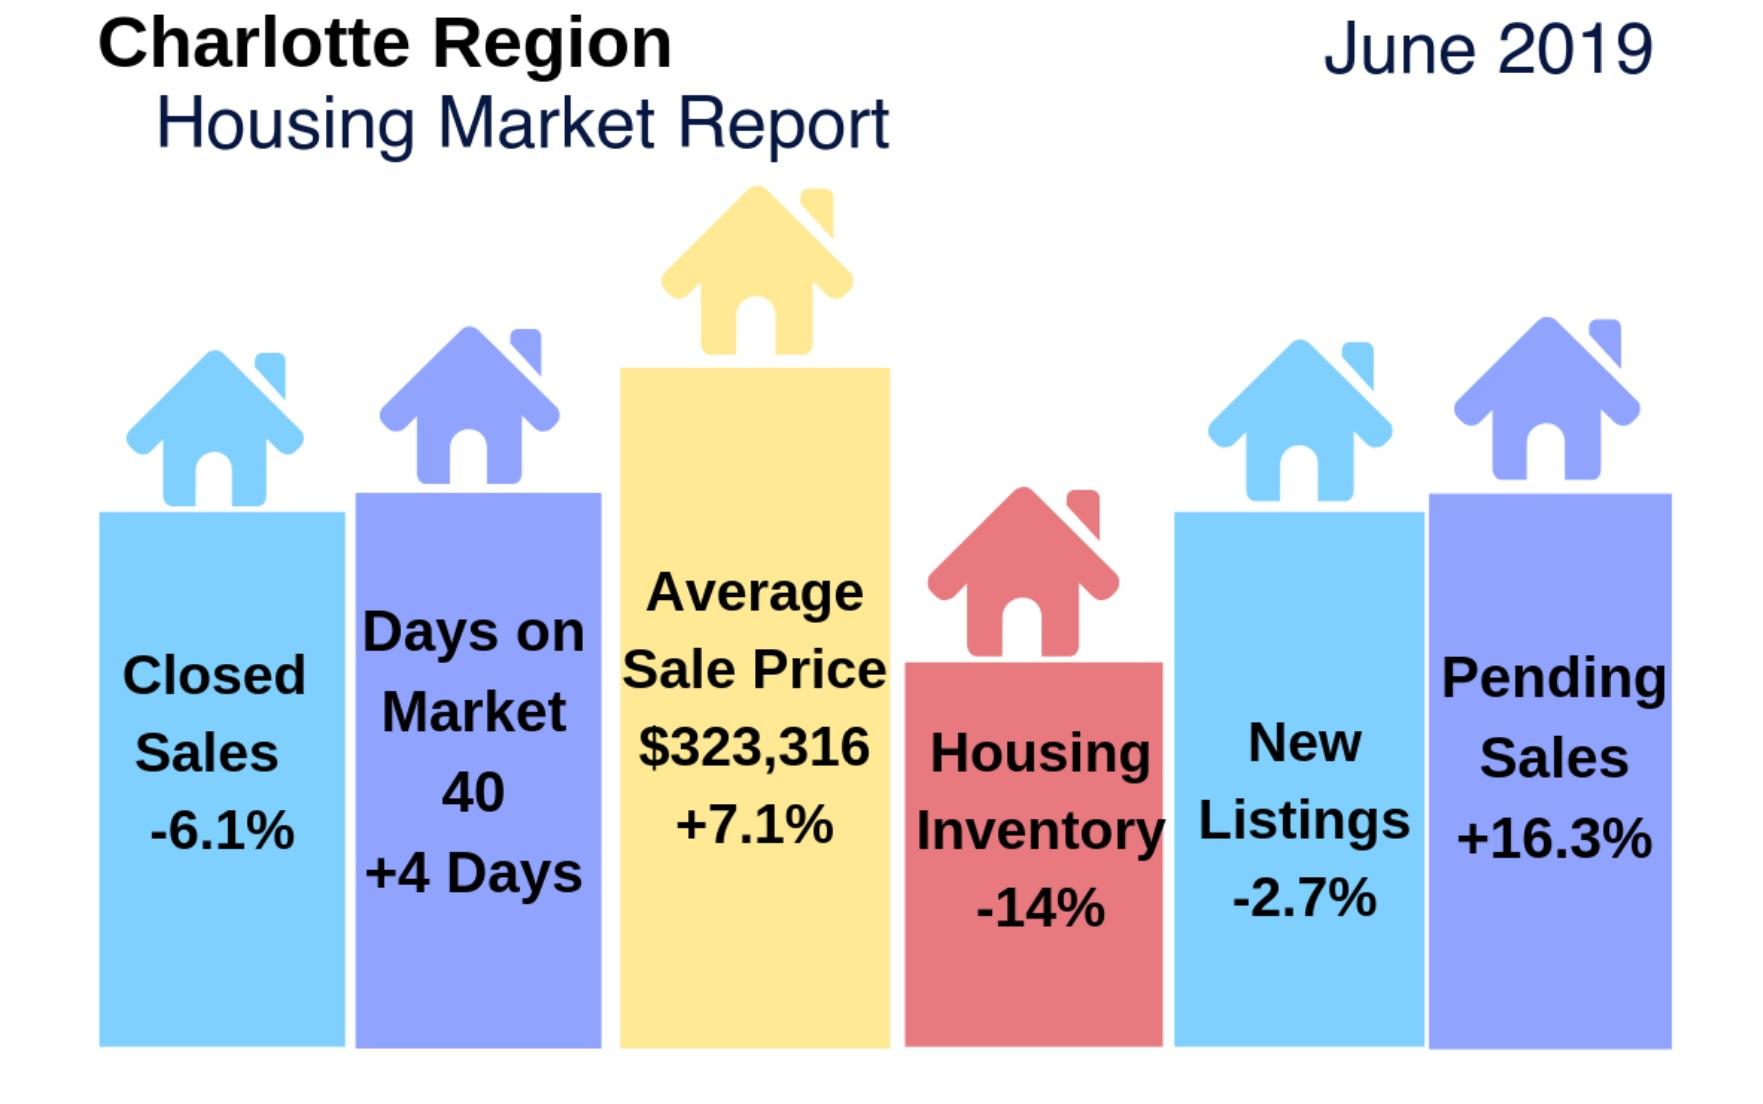 Charlotte Region Housing Update & Video: June 2019